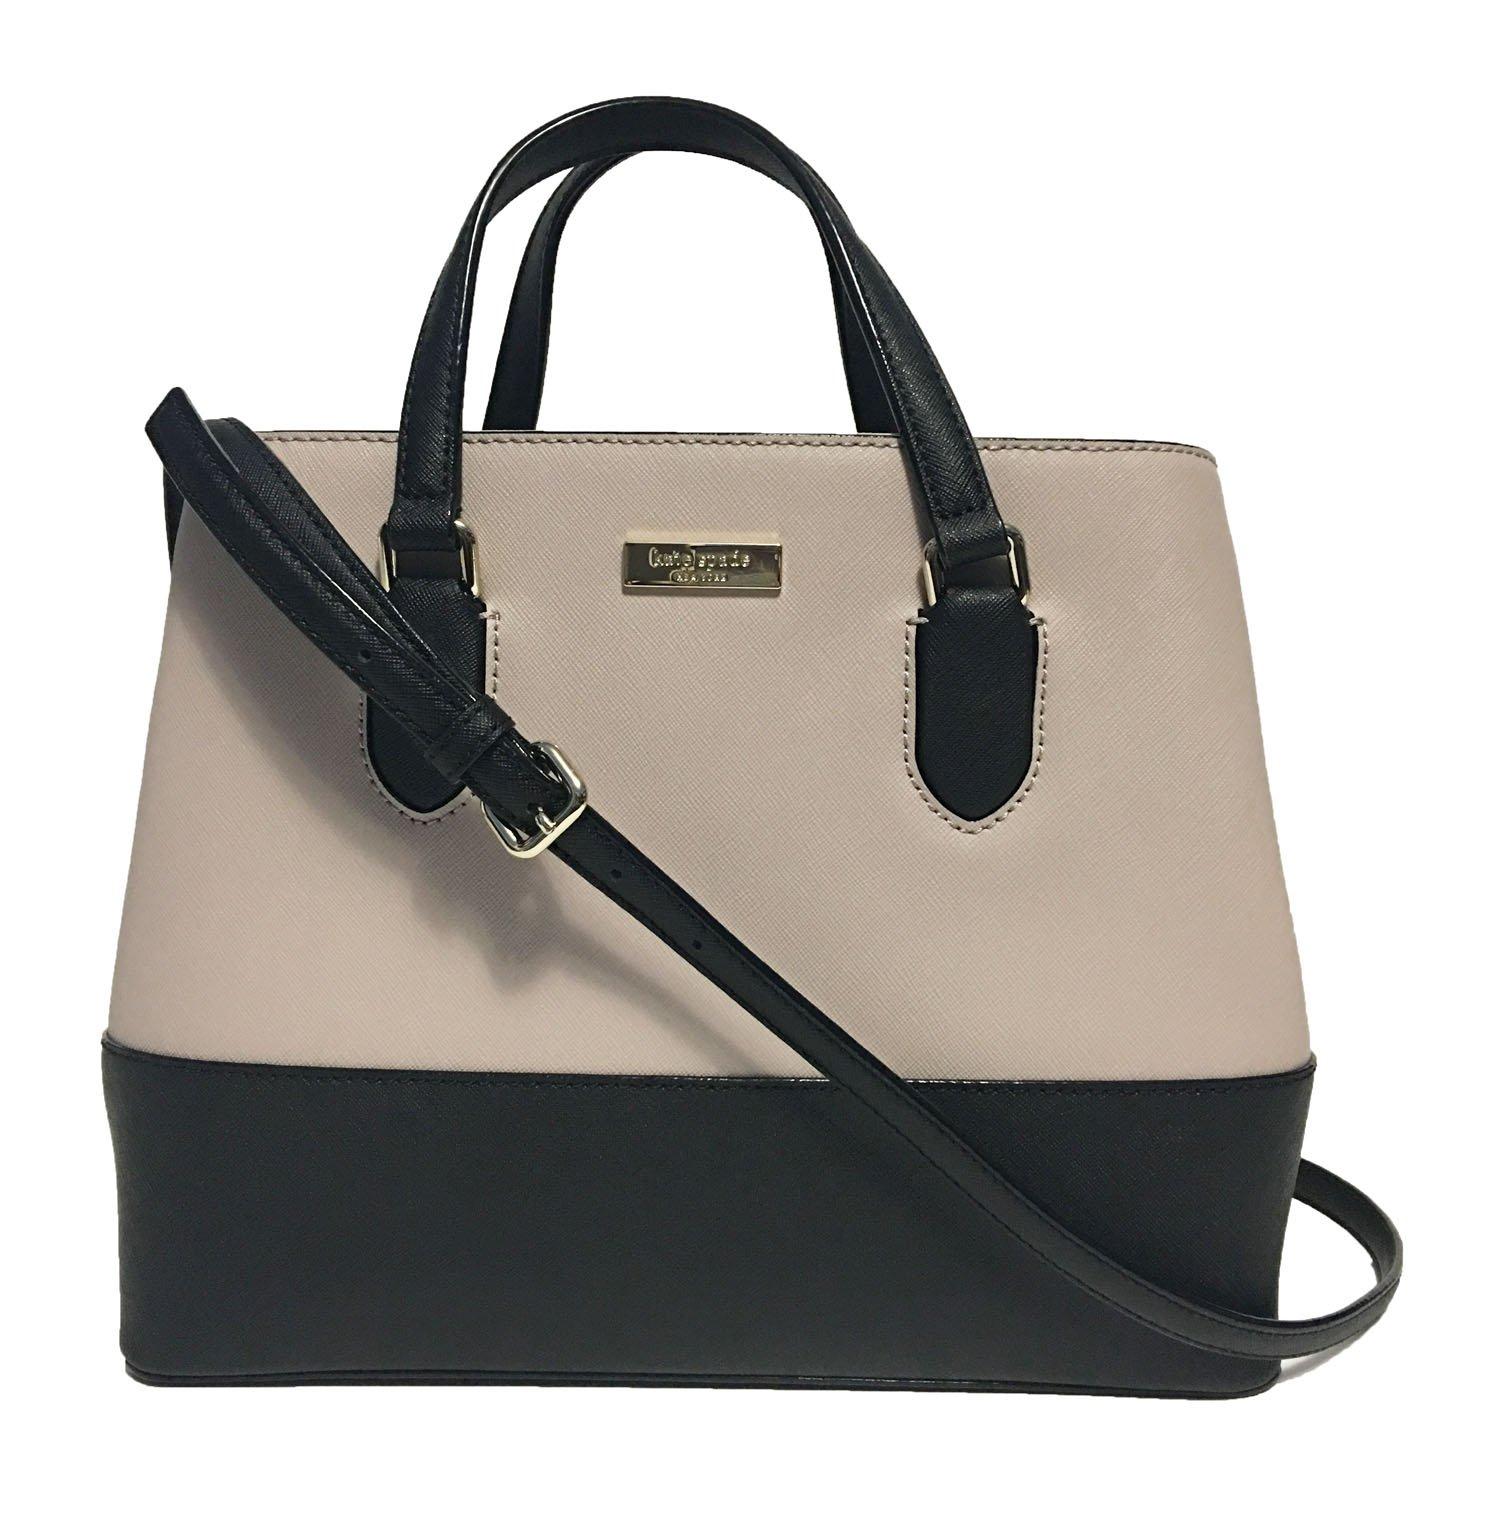 Kate Spade New York Laurel Way Evangelie Saffiano Leather Shoulder Bag Satchel (Almandine/Black)